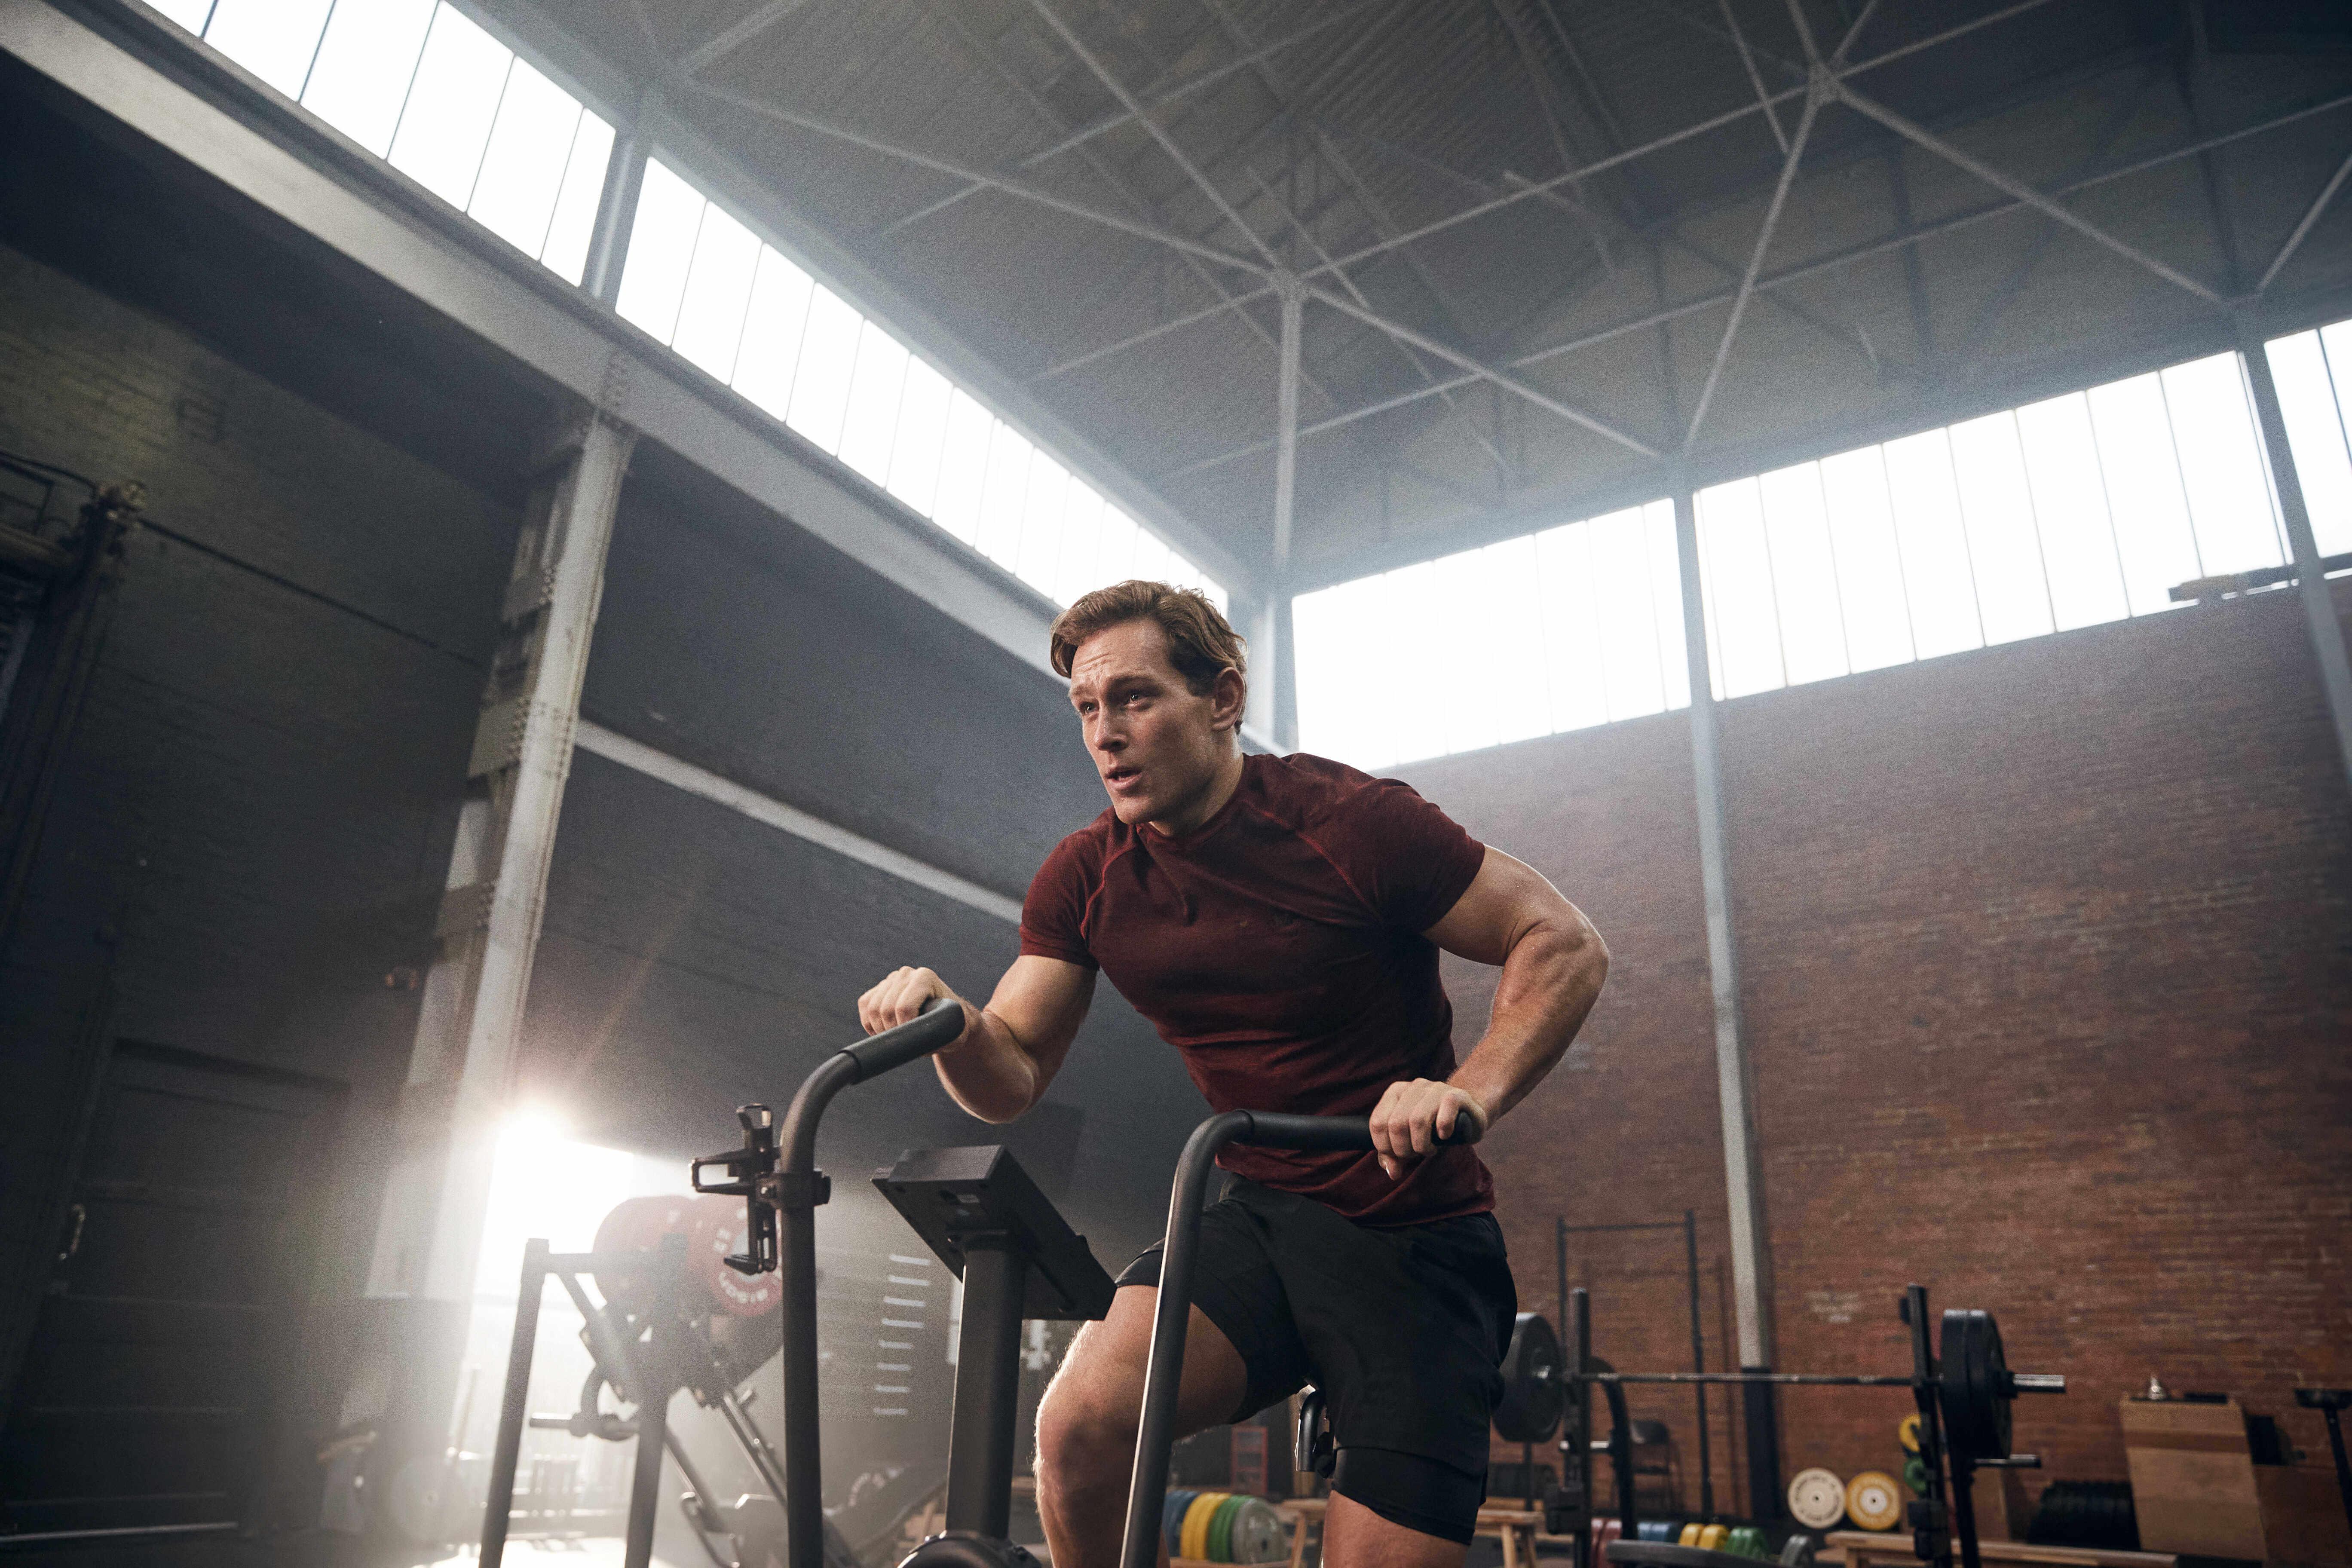 Retorne à sua rotina fitness